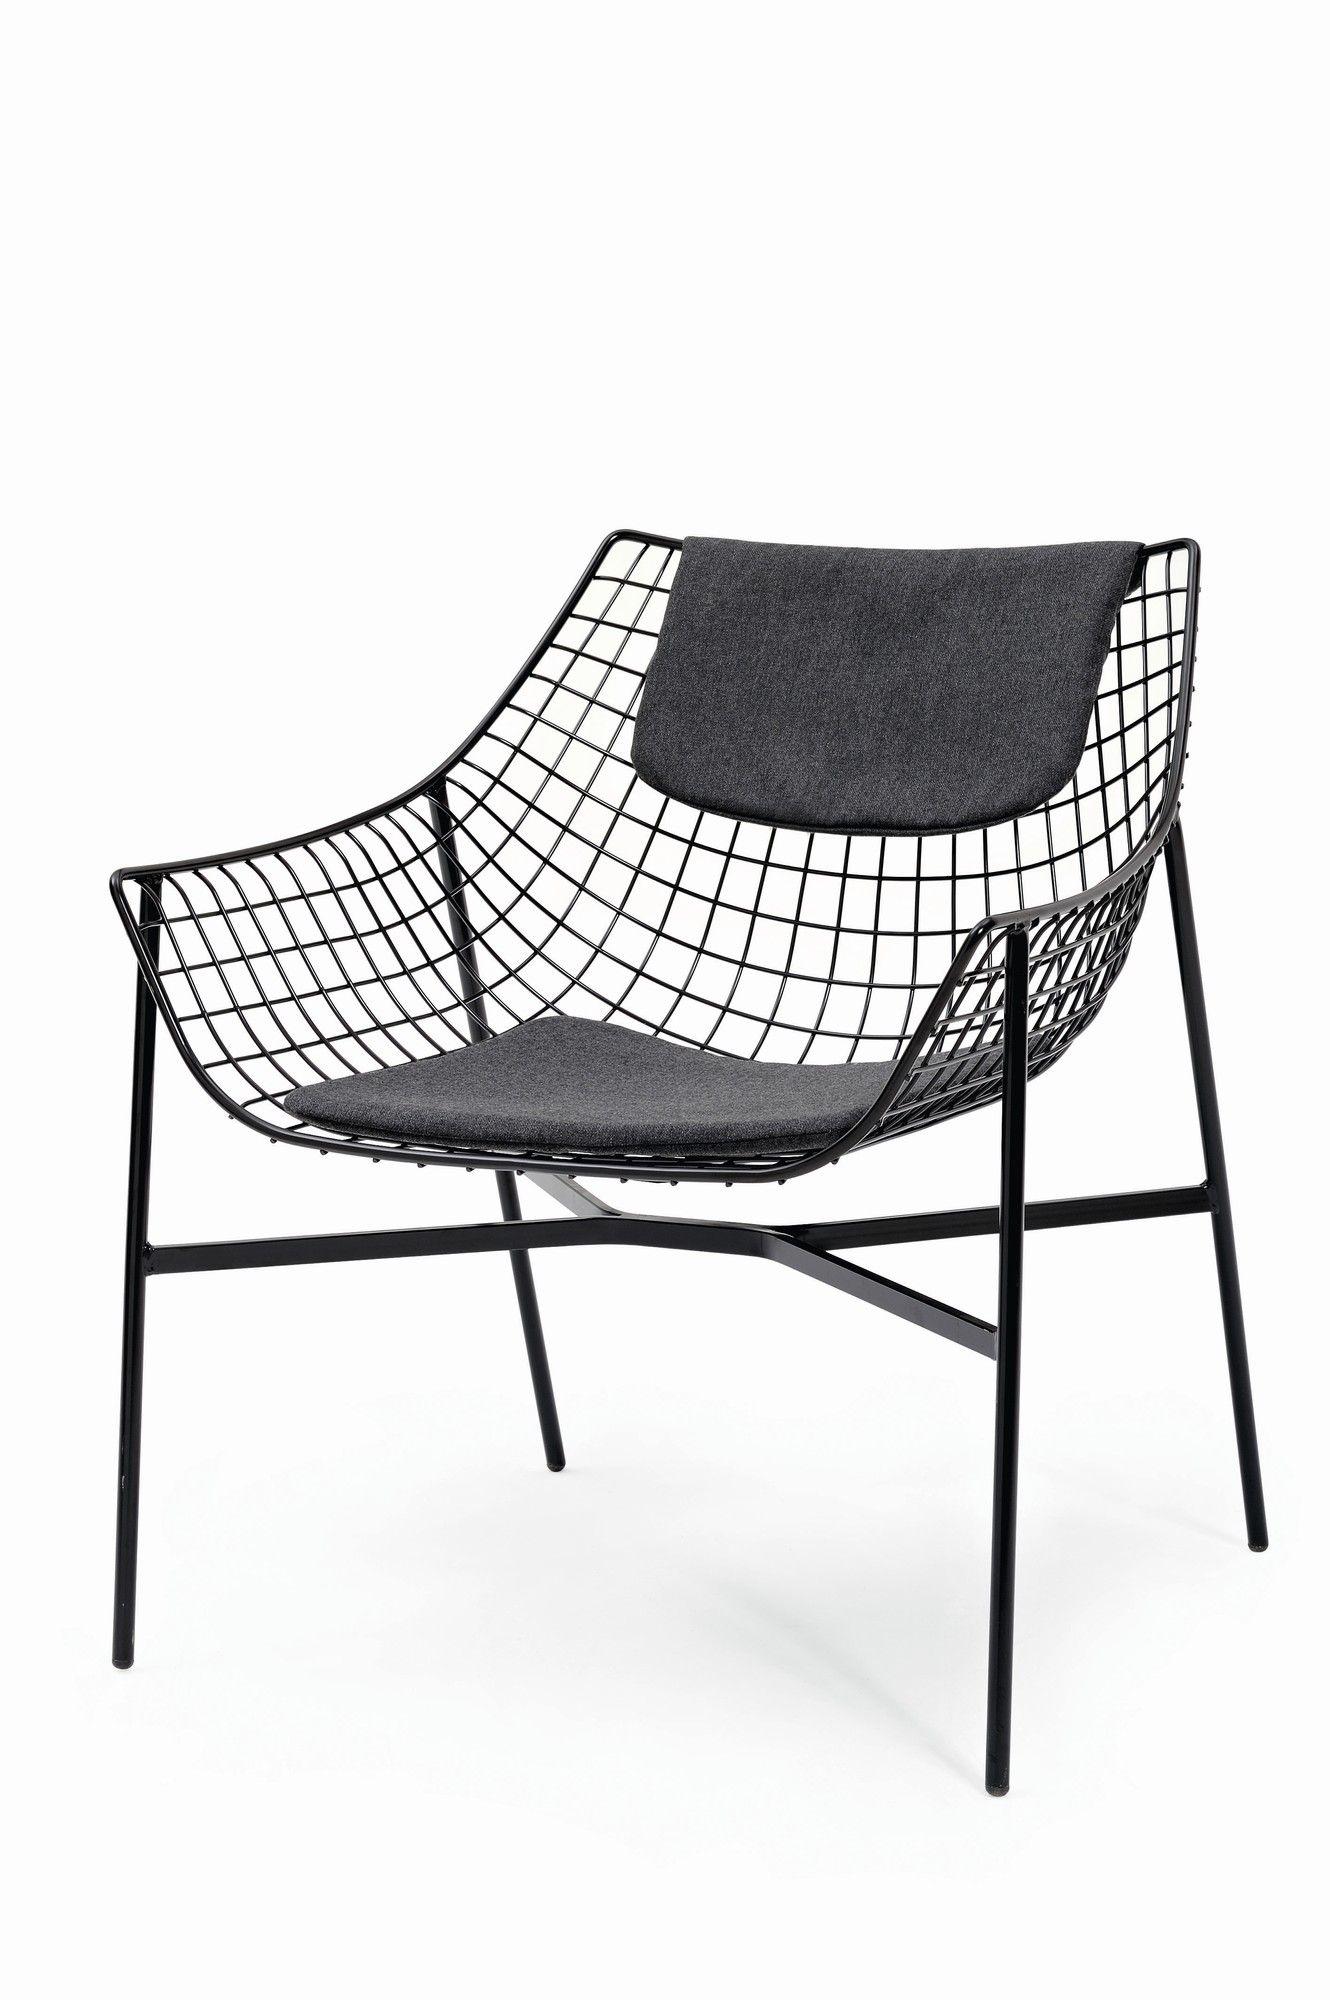 Varaschin Summer Set Lounge Chair Lounge Chair Outdoor Contemporary Outdoor Furniture Outdoor Armchair